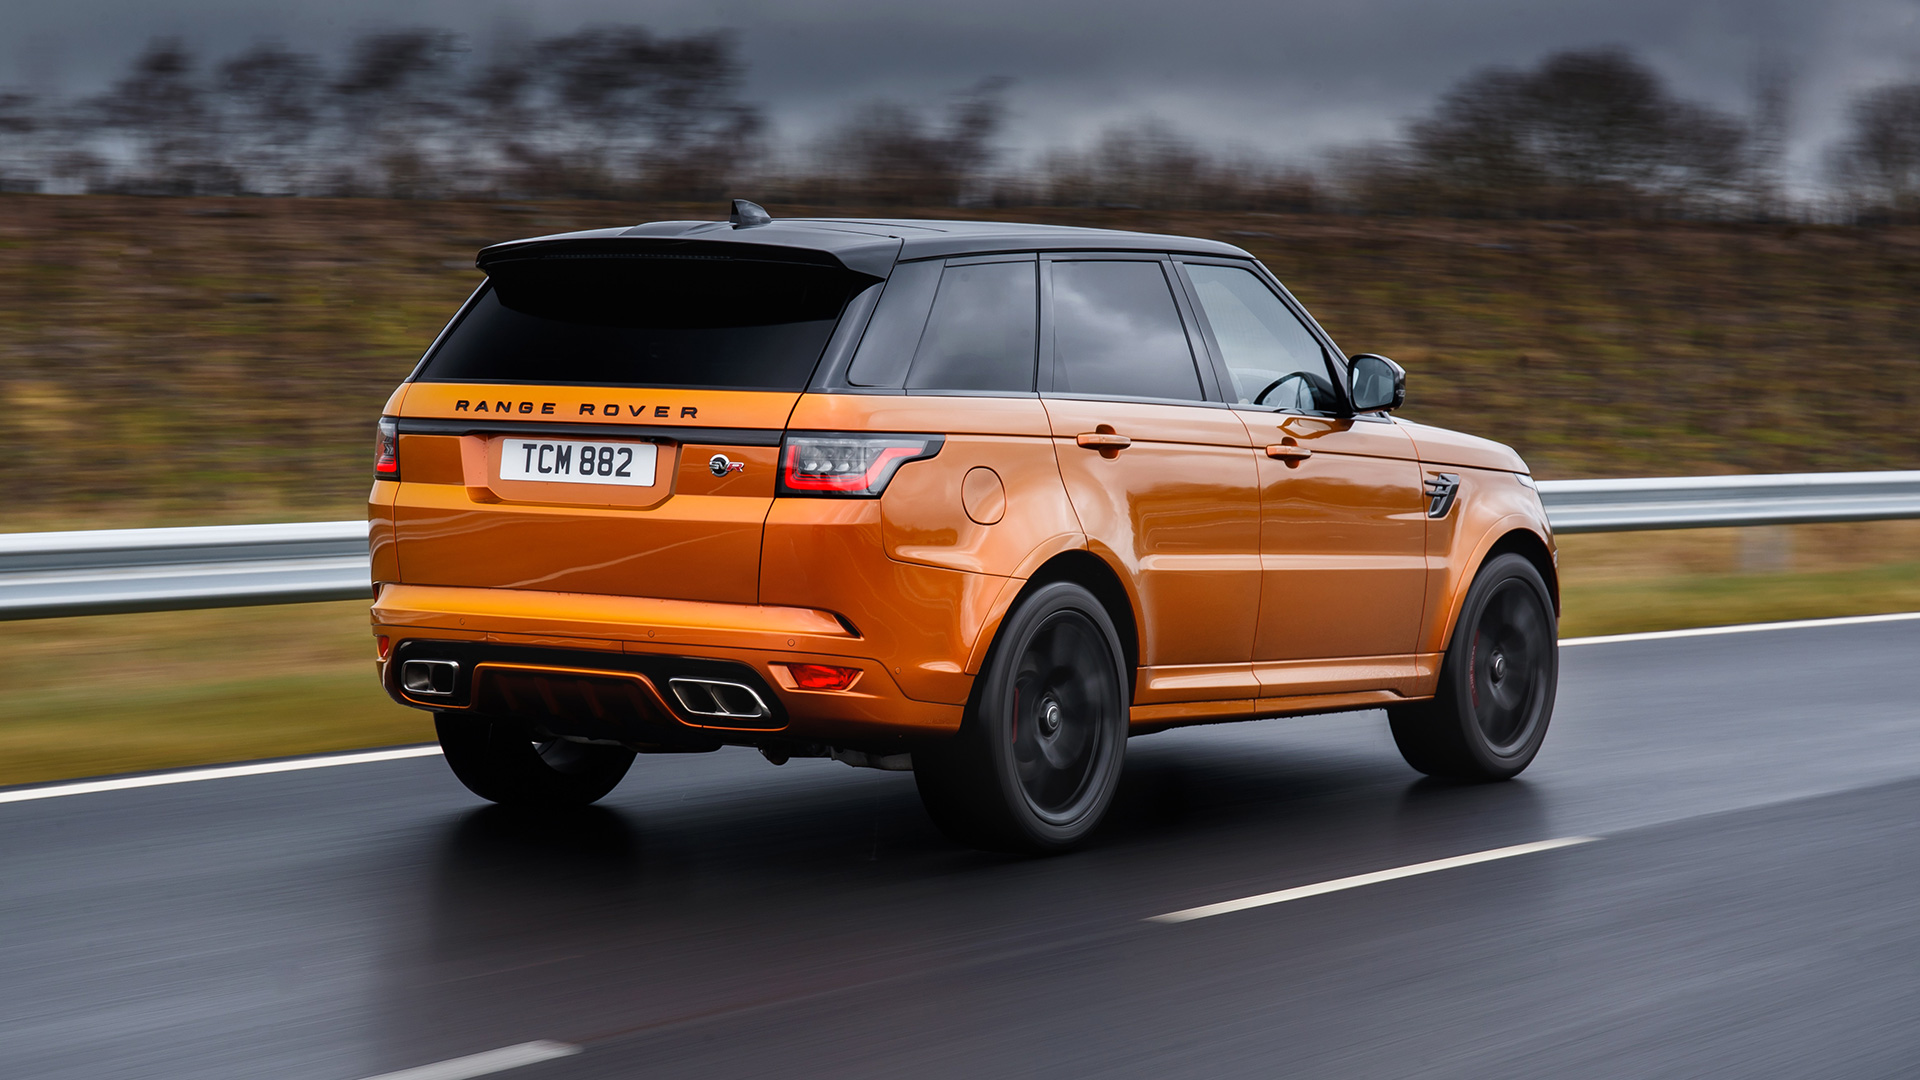 Land Rover Range Rover Sport 2018 SVR Exterior Car s Overdrive